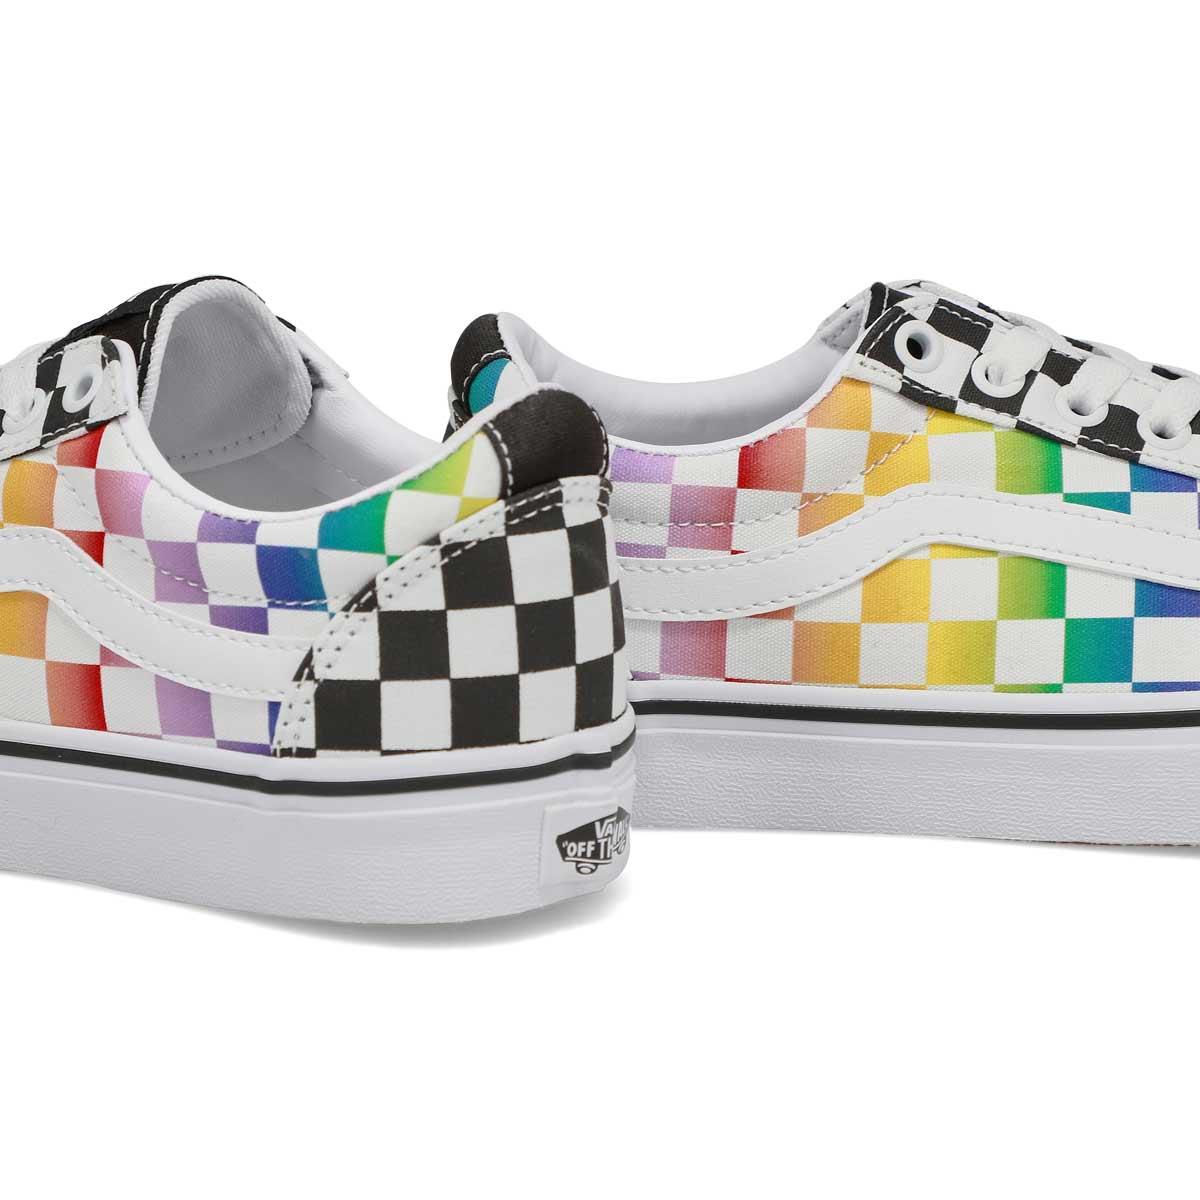 Women's Ward Sneaker - Checkered Rainbow/Blk/Wht